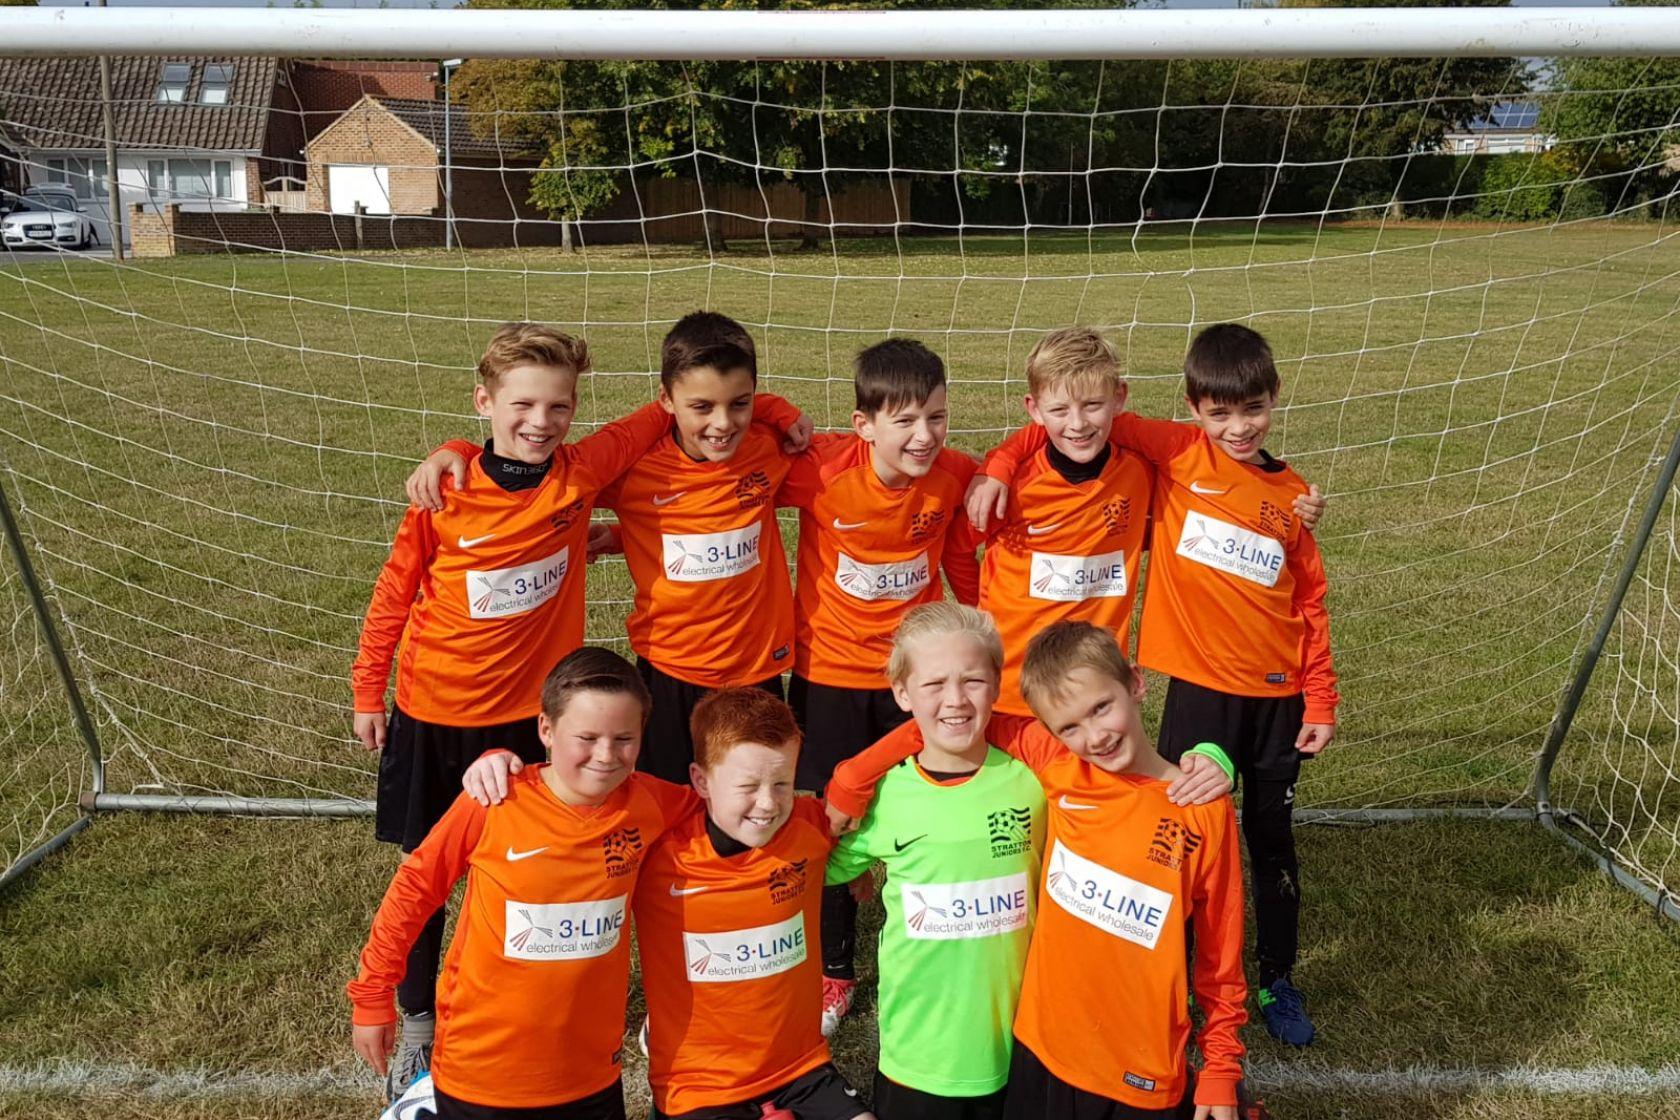 Stratton Juniors Football Club